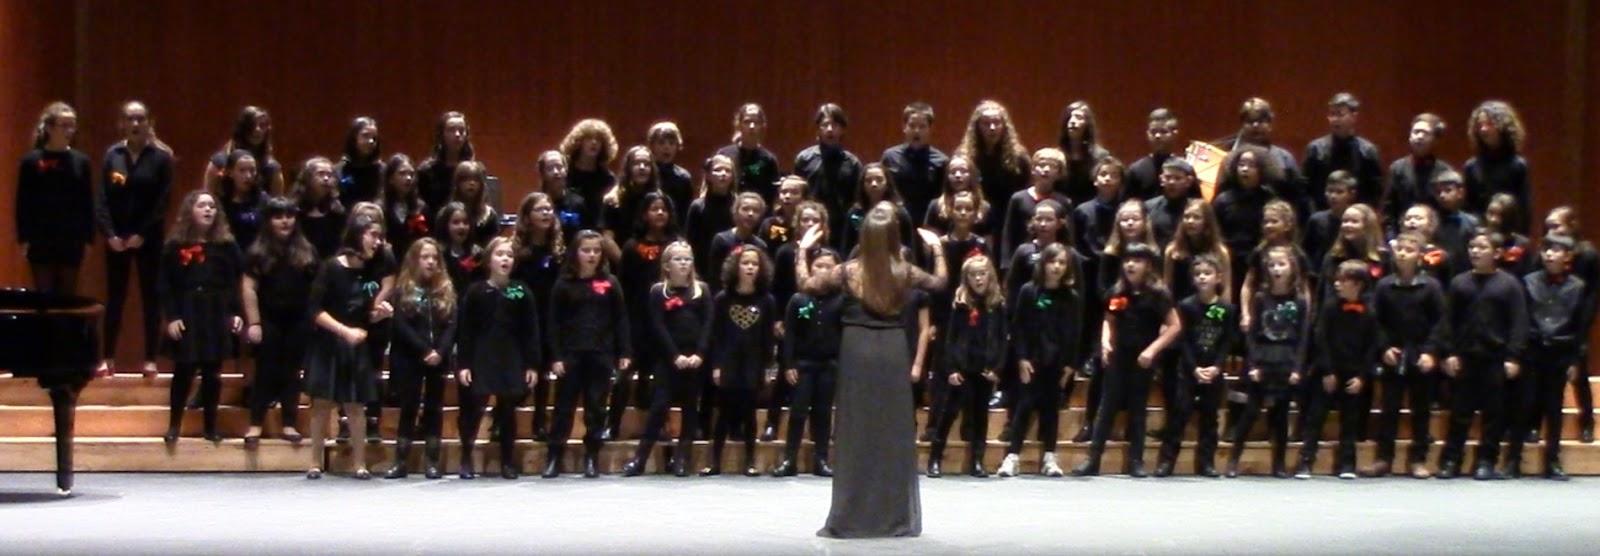 O noso concerto no Auditorio de Ferrol